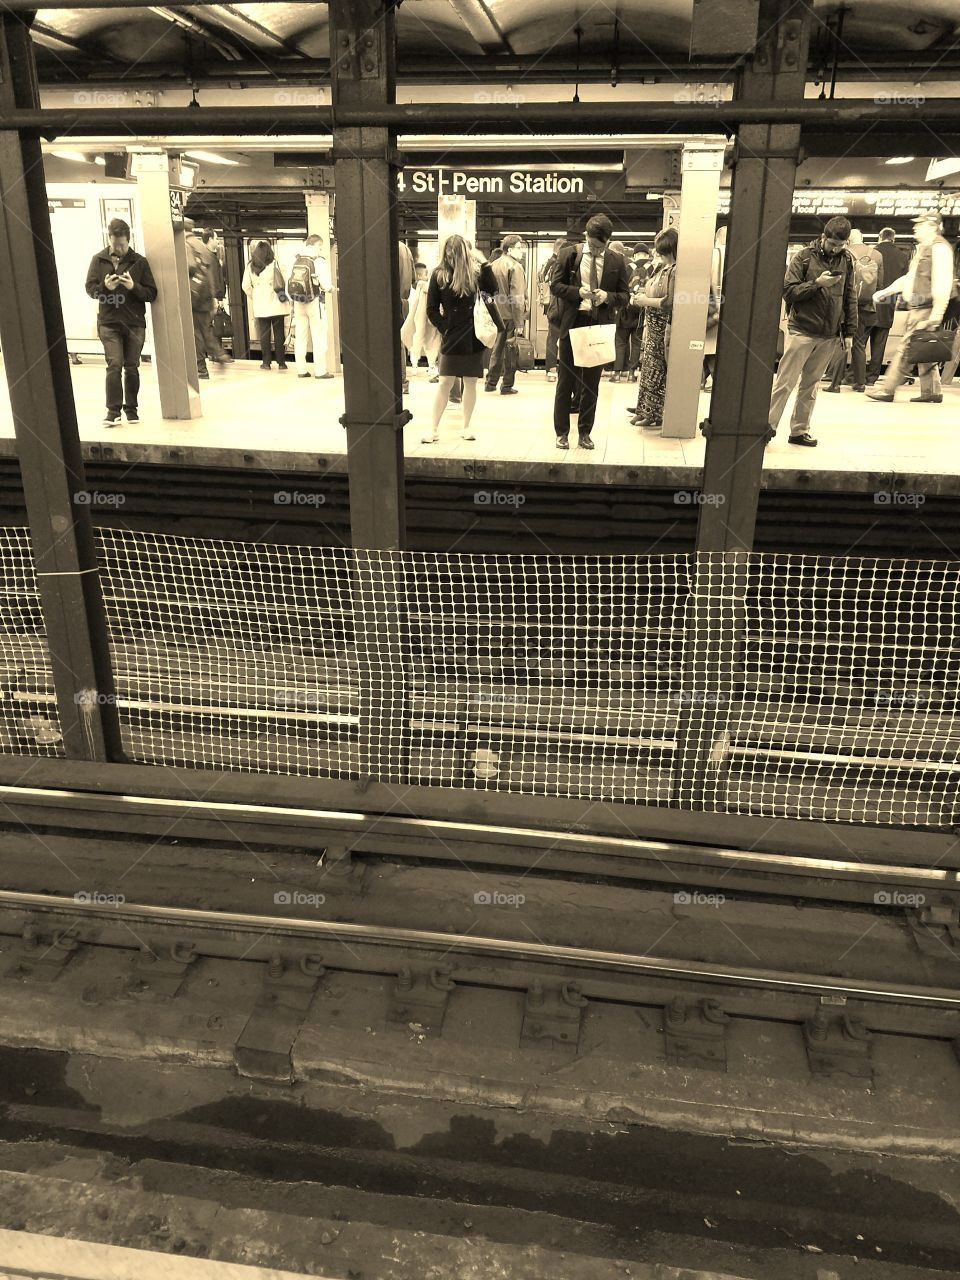 Subway System, Airport, Train, Transportation System, Station